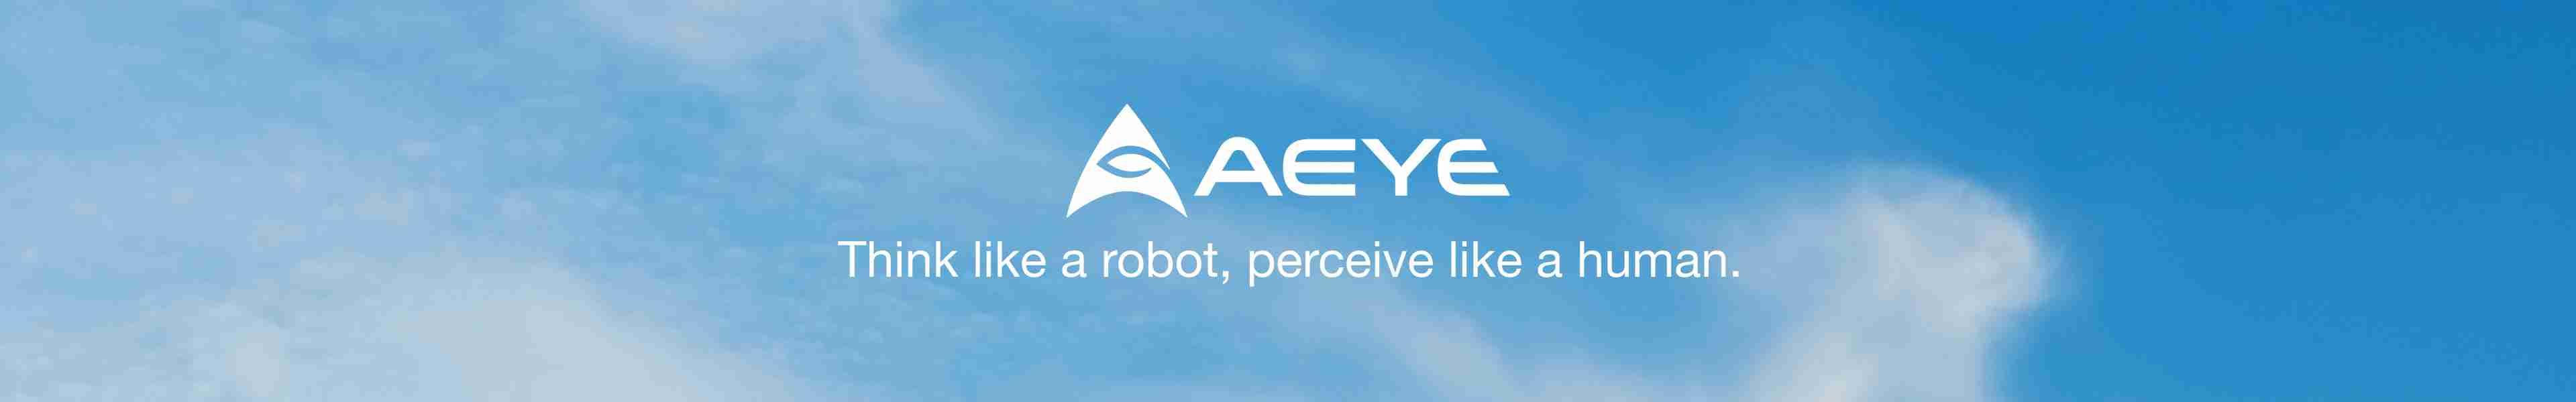 AEye - Think Like A Robot, Perceive Like A Human